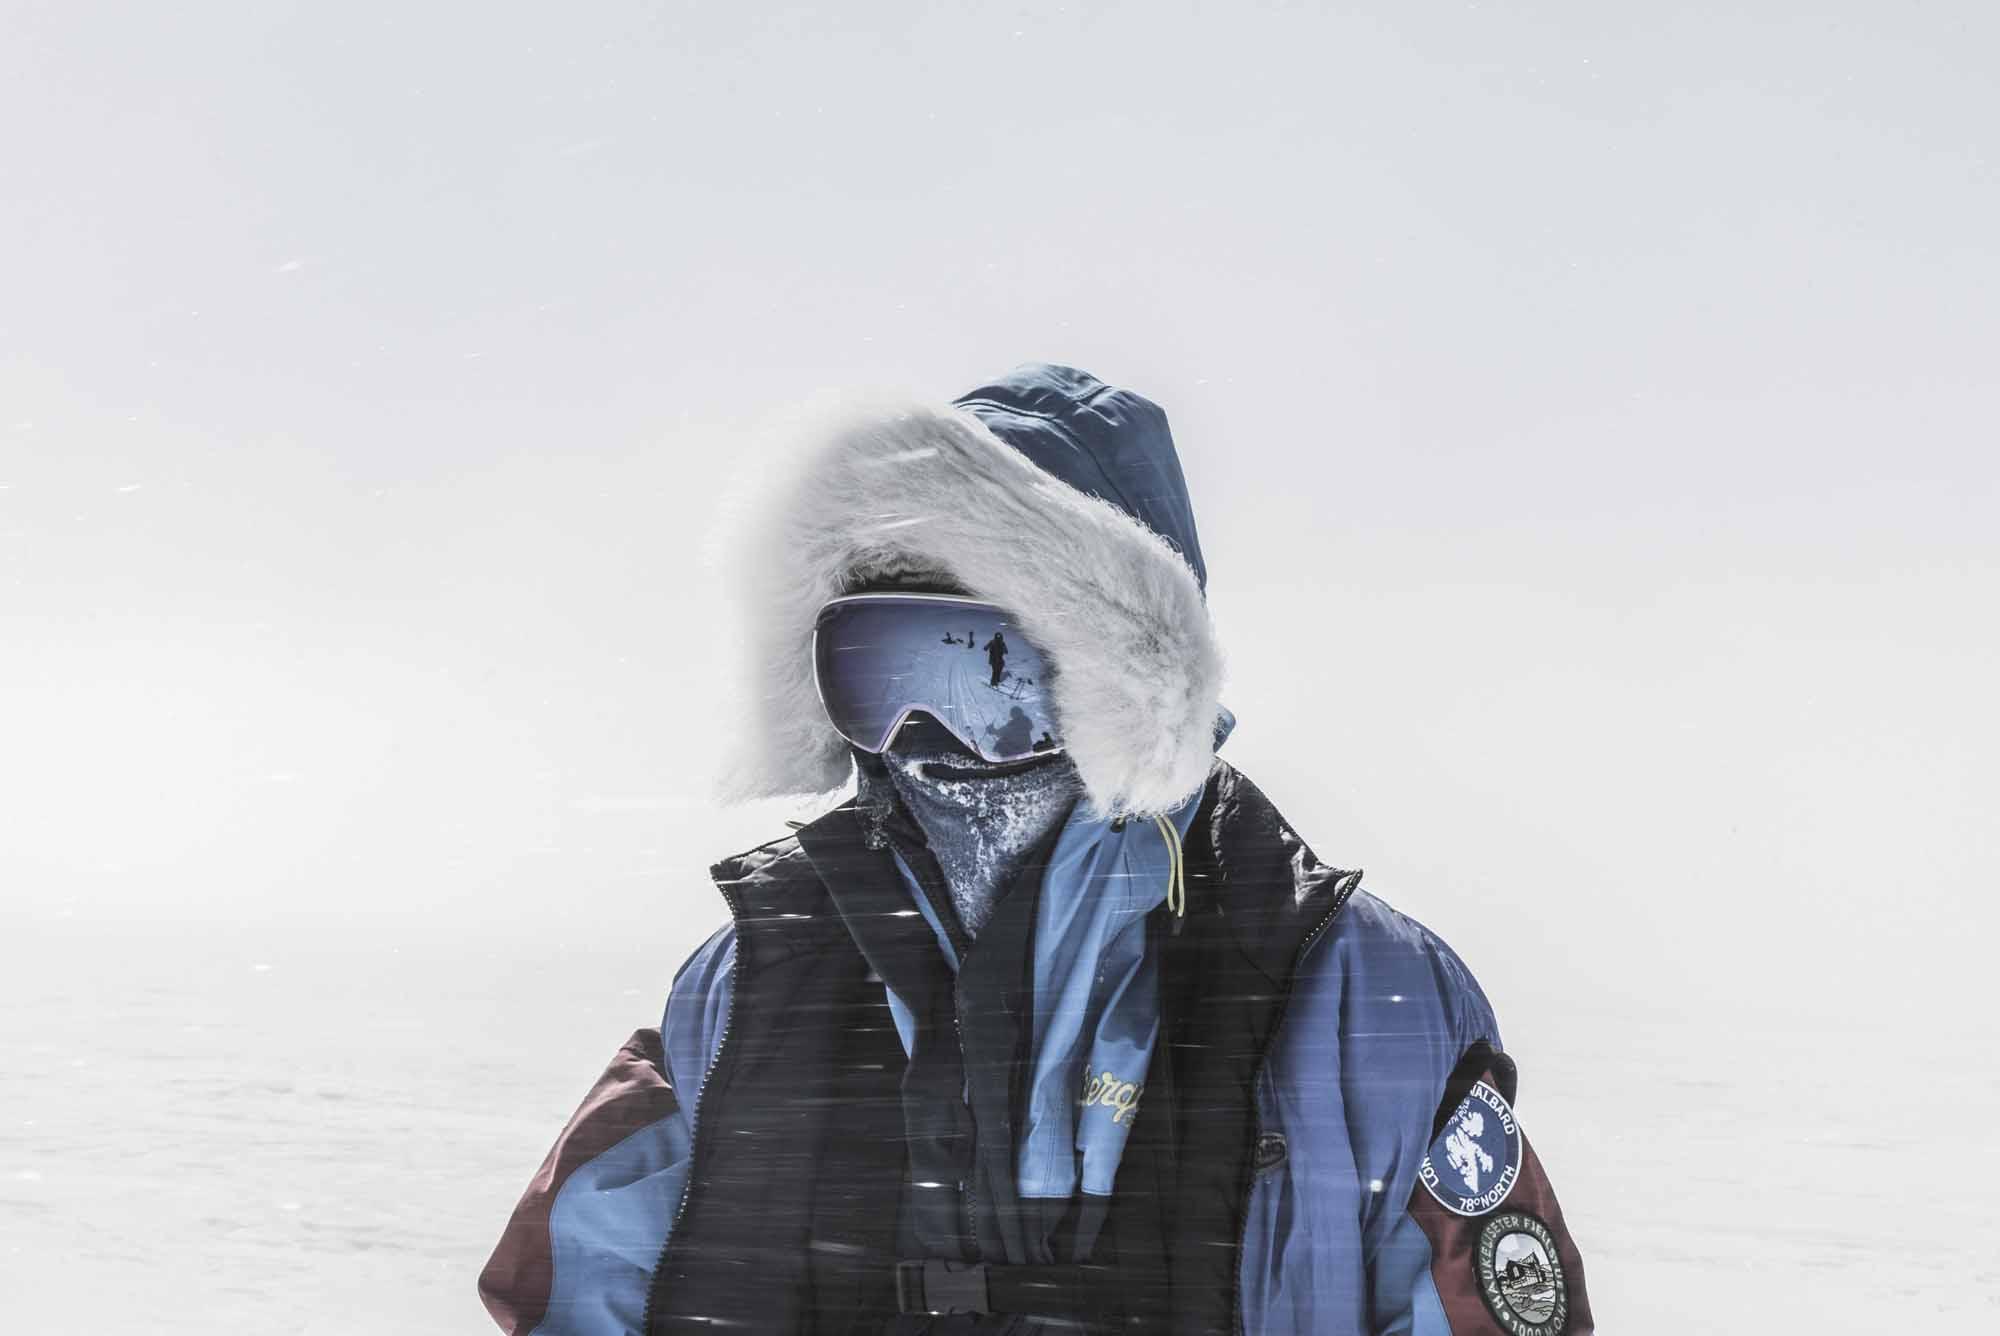 Polar-Quest-Exploration-Polaire-Exploring-Boundaries-in-Antarctica-Caroline-Cote-photo-blue-jacket-windy